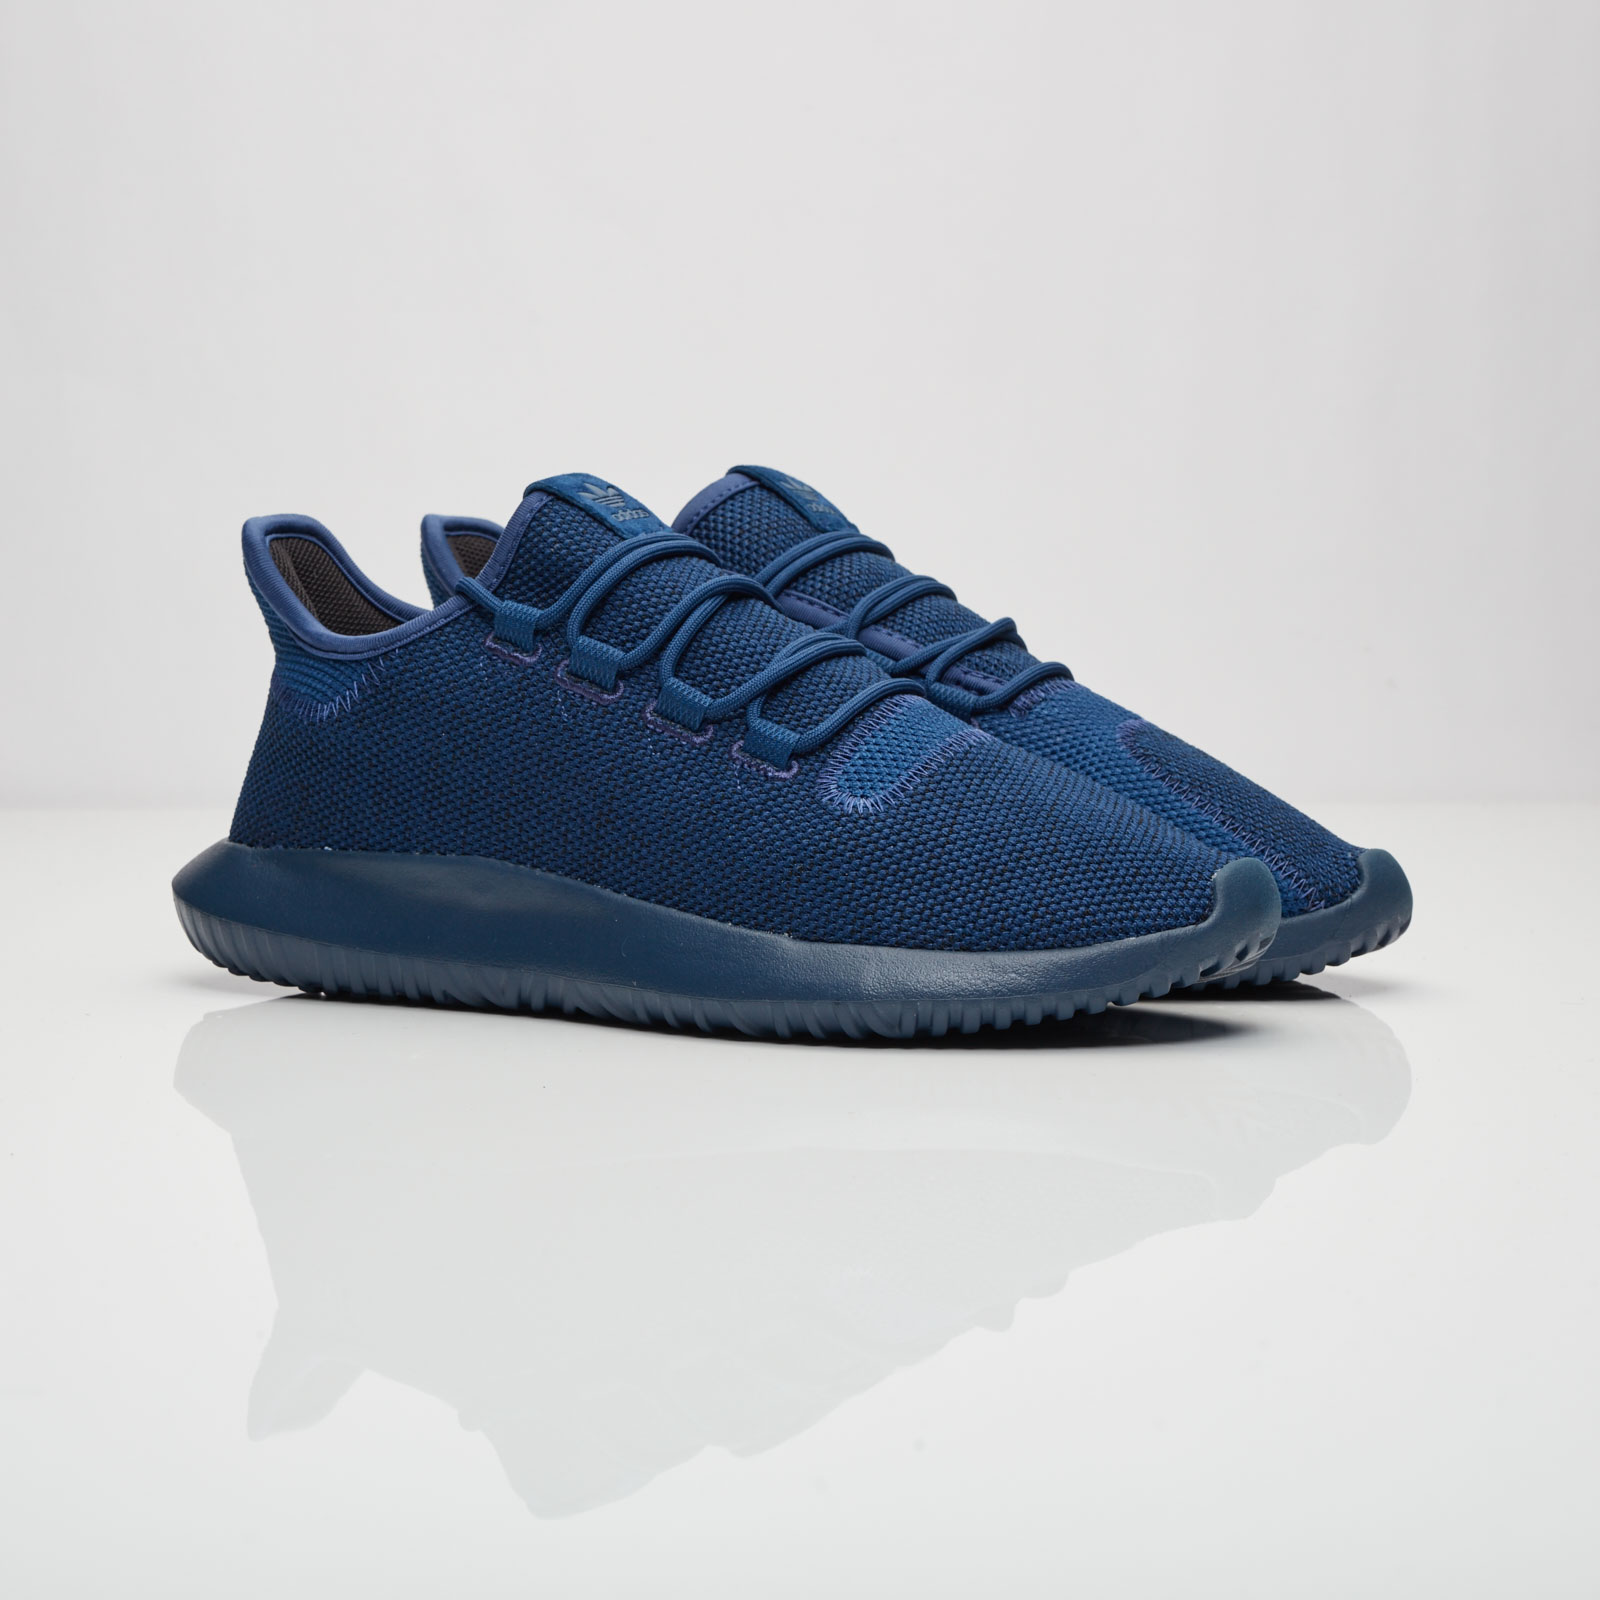 tubolari a bb8825 sneakersnstuff scarpe adidas ombra